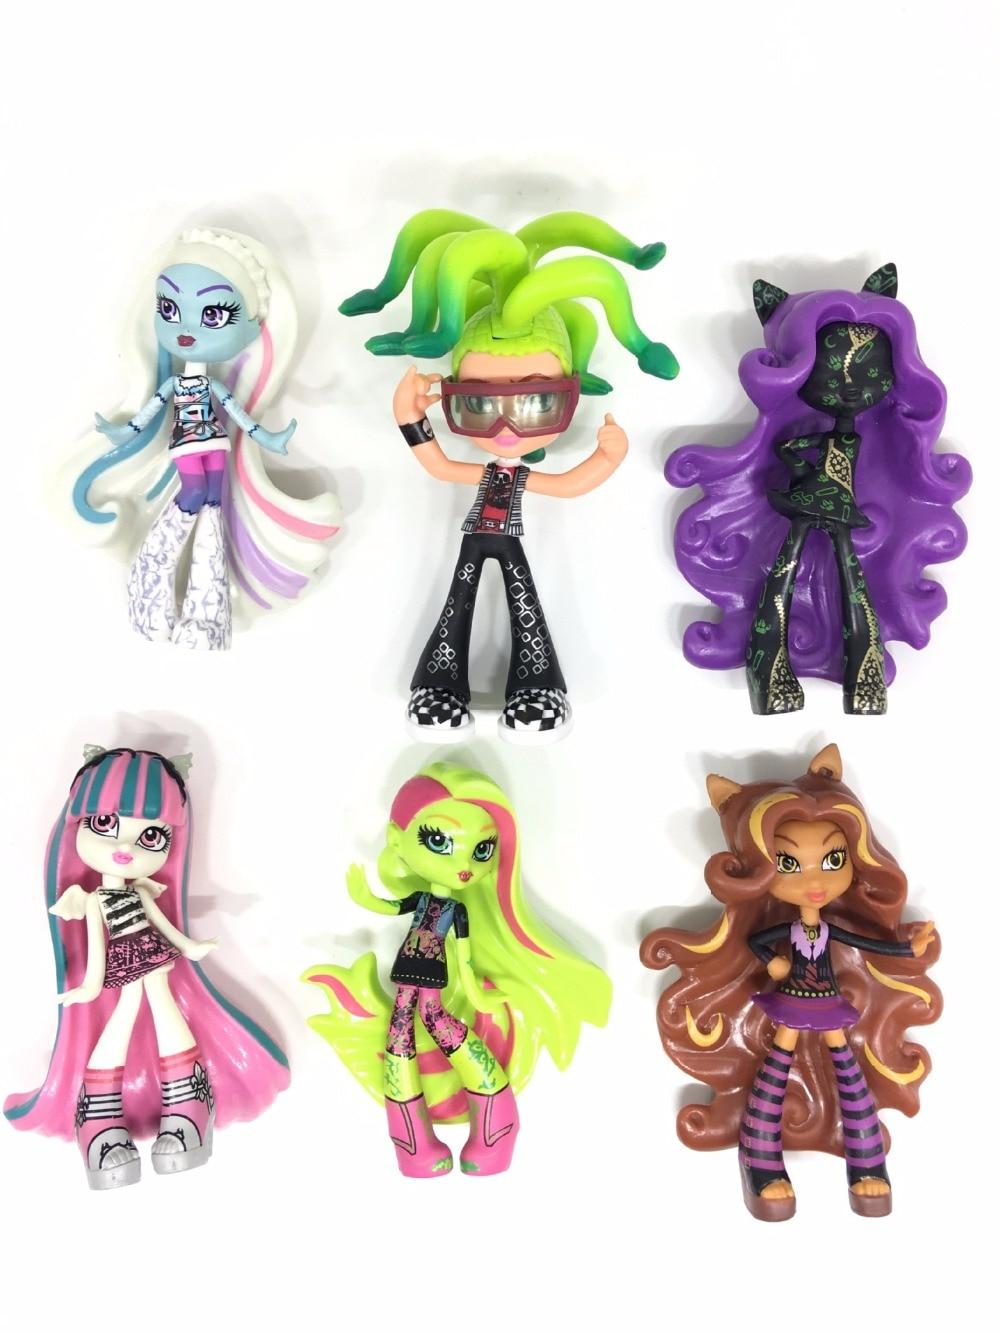 6pcs/set Monsters High School PVC Action Figures Dolls Grils Casual Clothes Fashionable Dresses Collection Toys for Children<br><br>Aliexpress